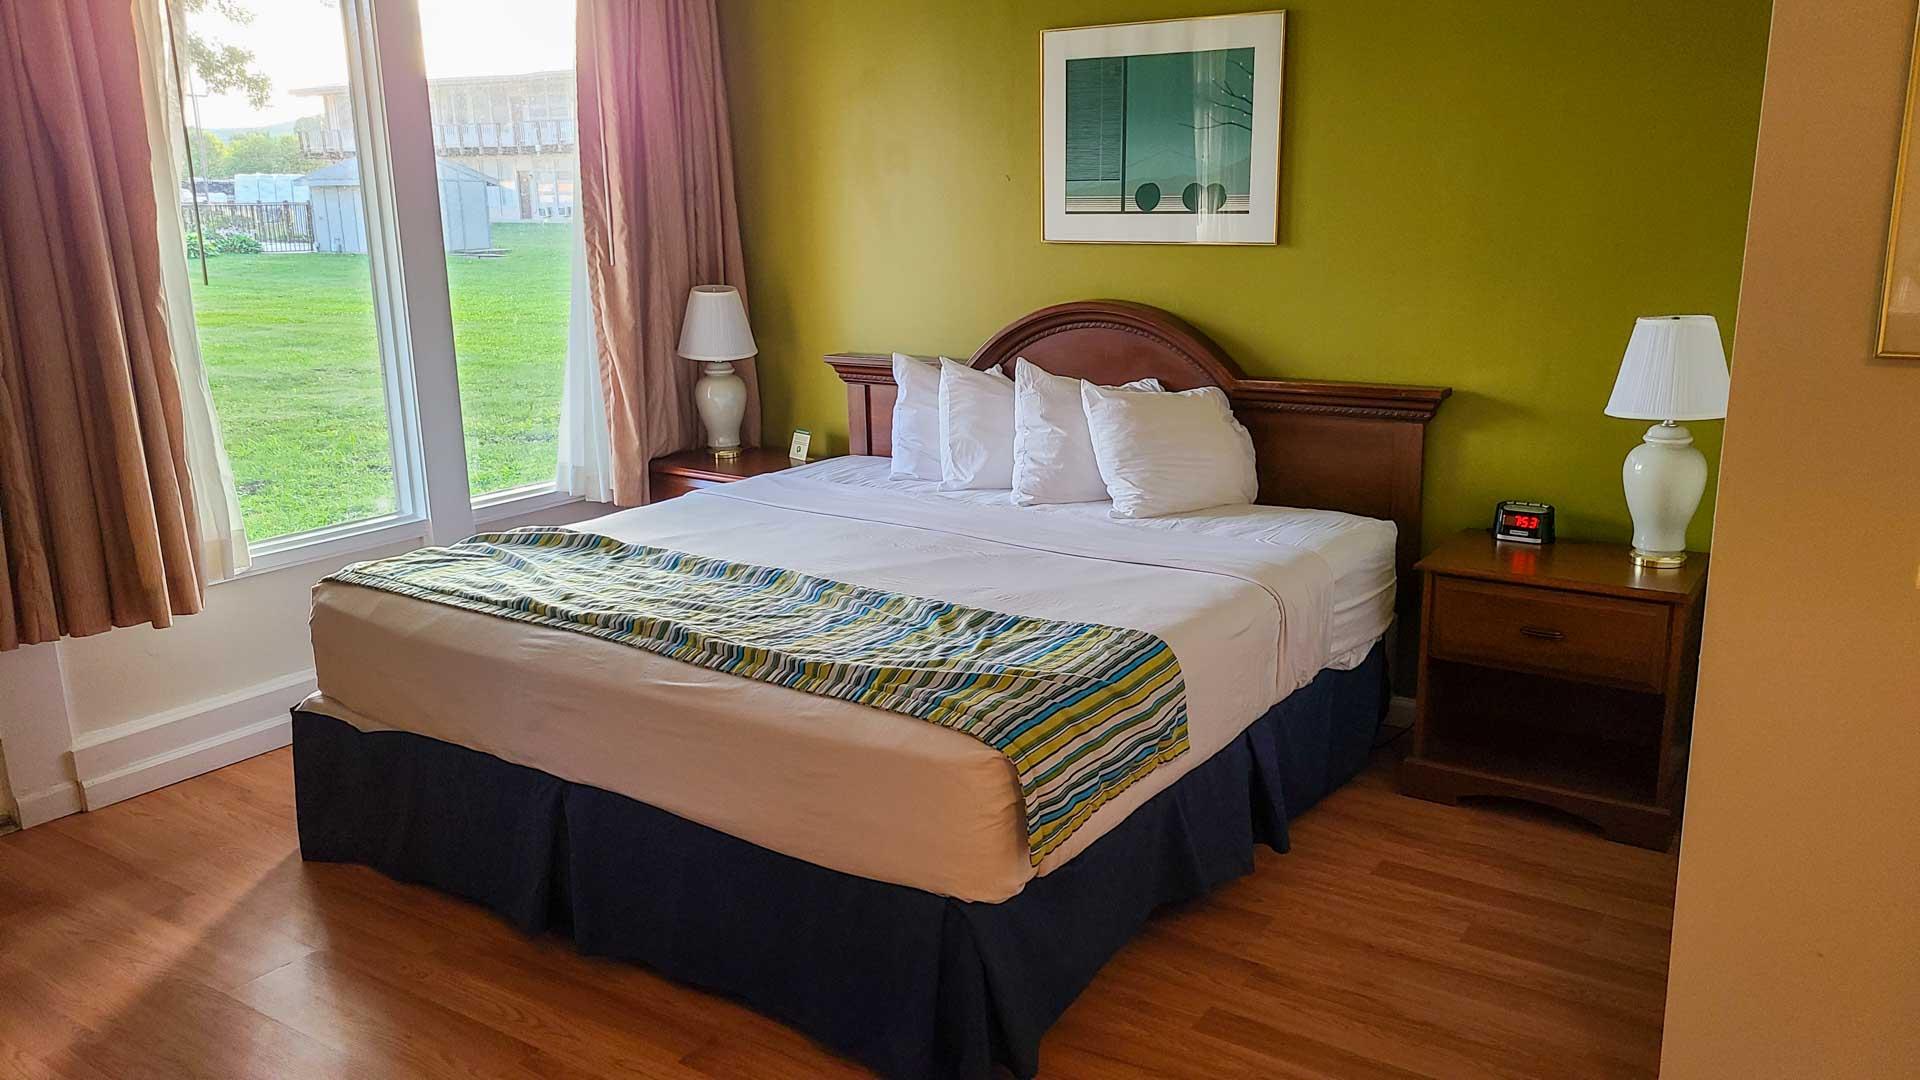 Americas Best Value Inn, nuestro alojamiento en los Finger Lakes